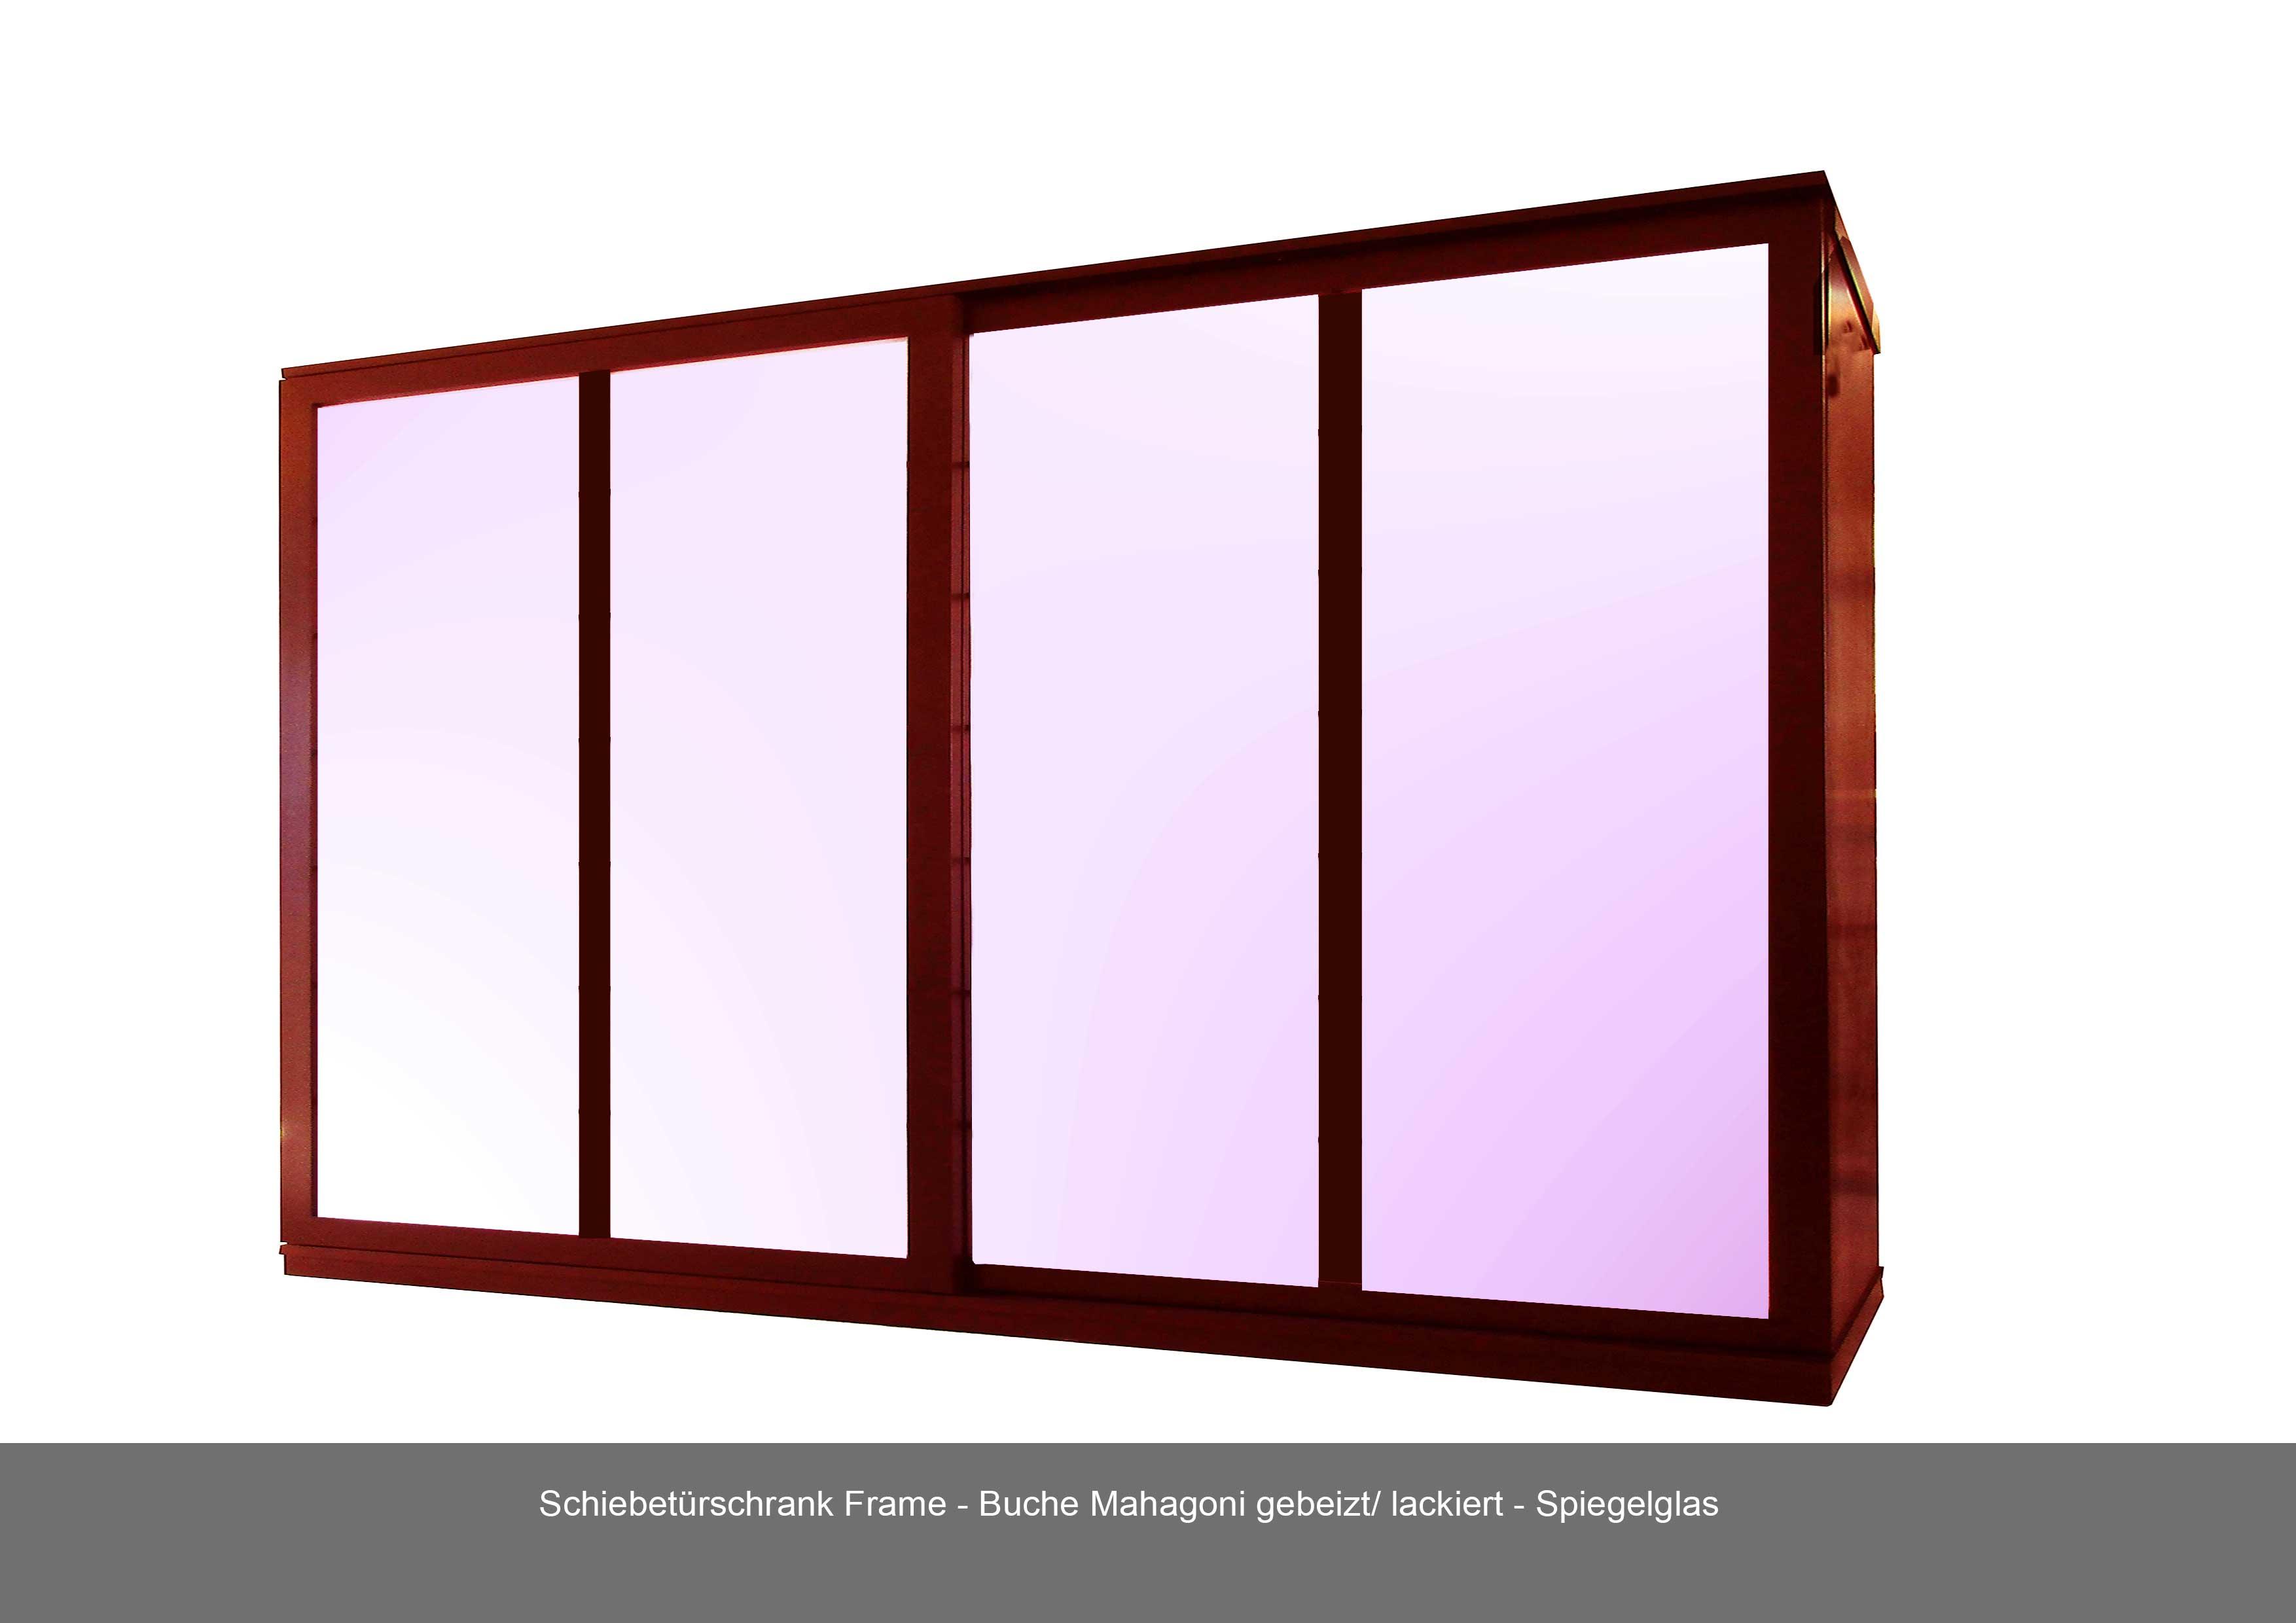 Schiebetuerschrank Naturholz Mahagoni Spiegelglas